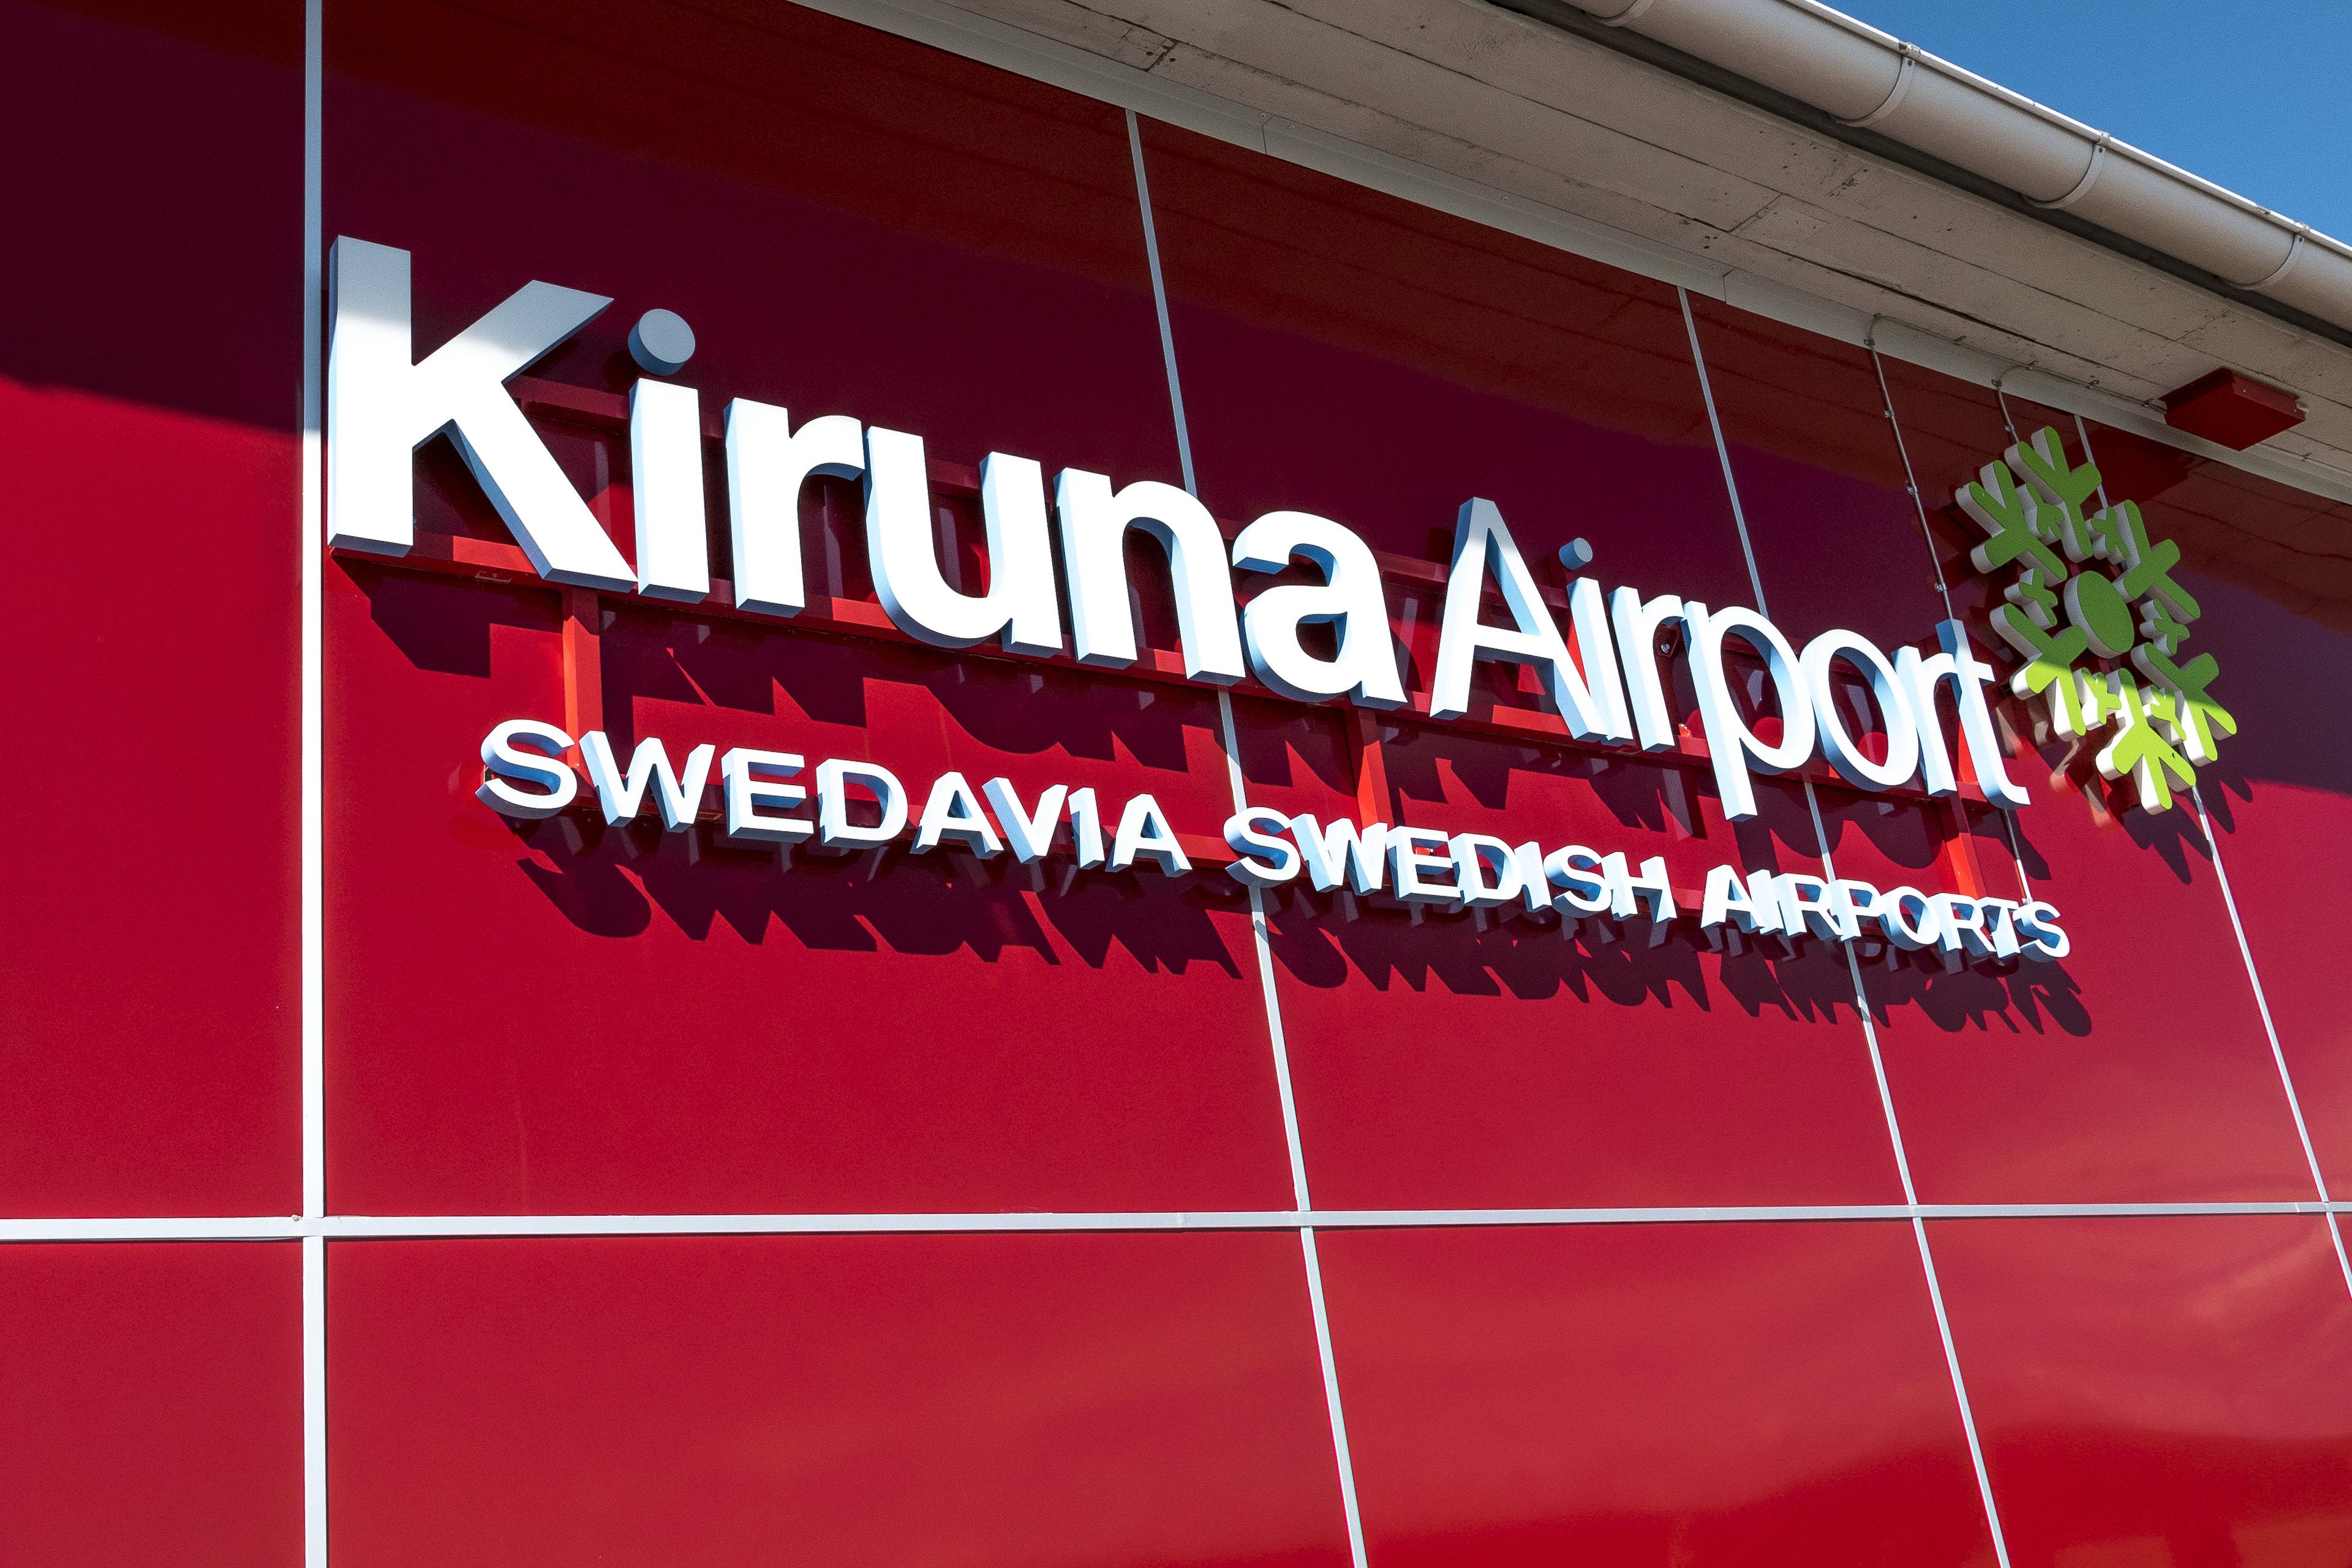 Kiruna Airport,©Markus Proske—Panasonic DMC-LX100, 32mm, 1/1000s, Blende 6.3, ISO 200